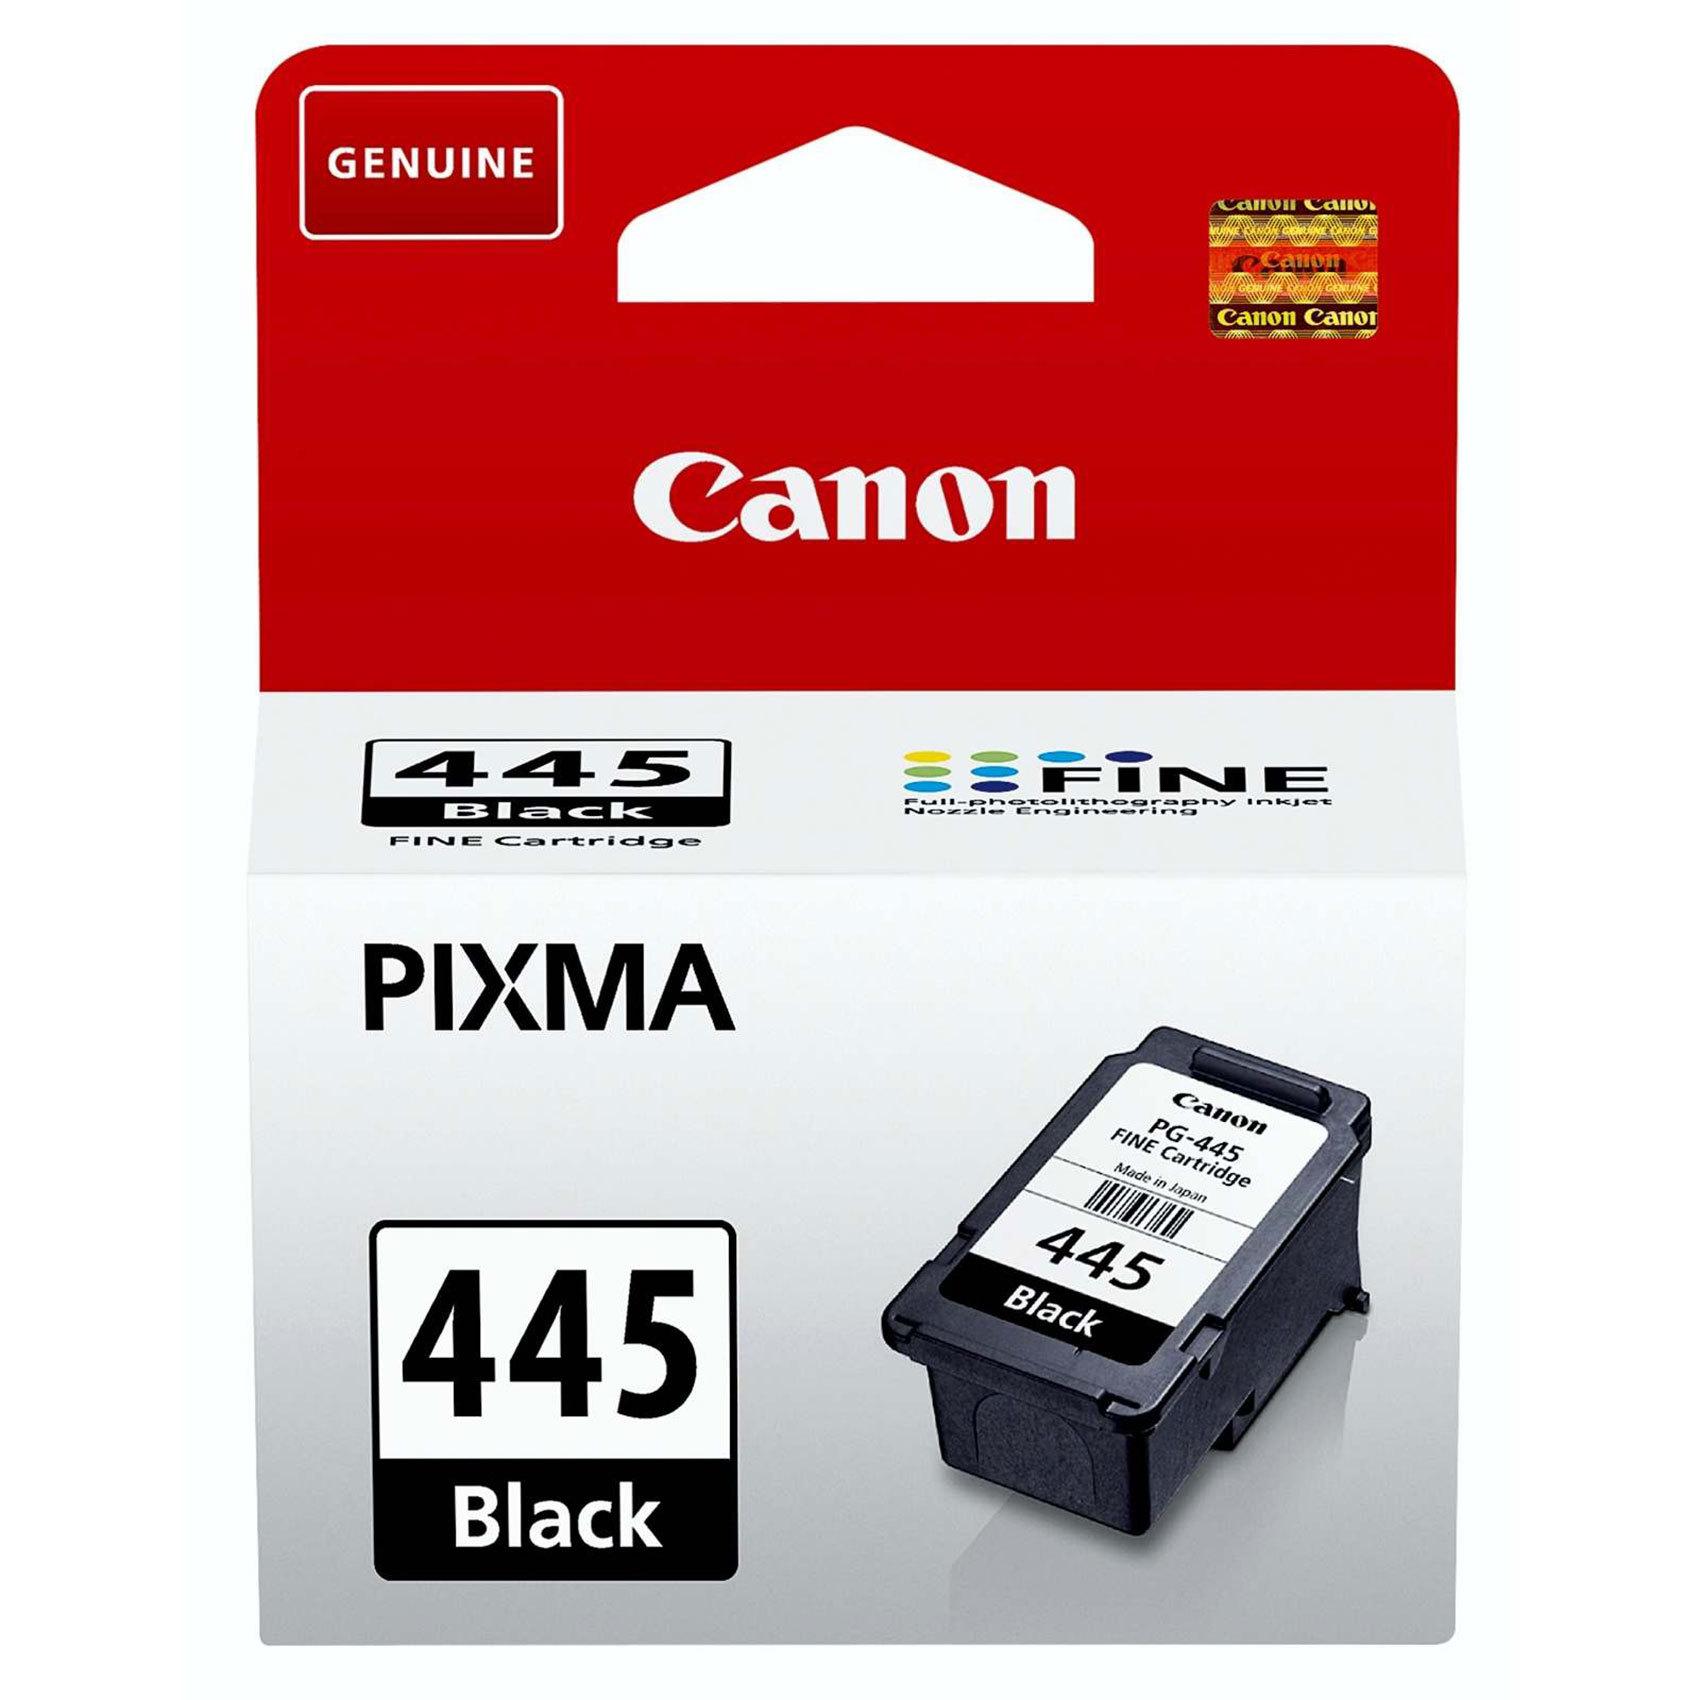 CANON CART PG445